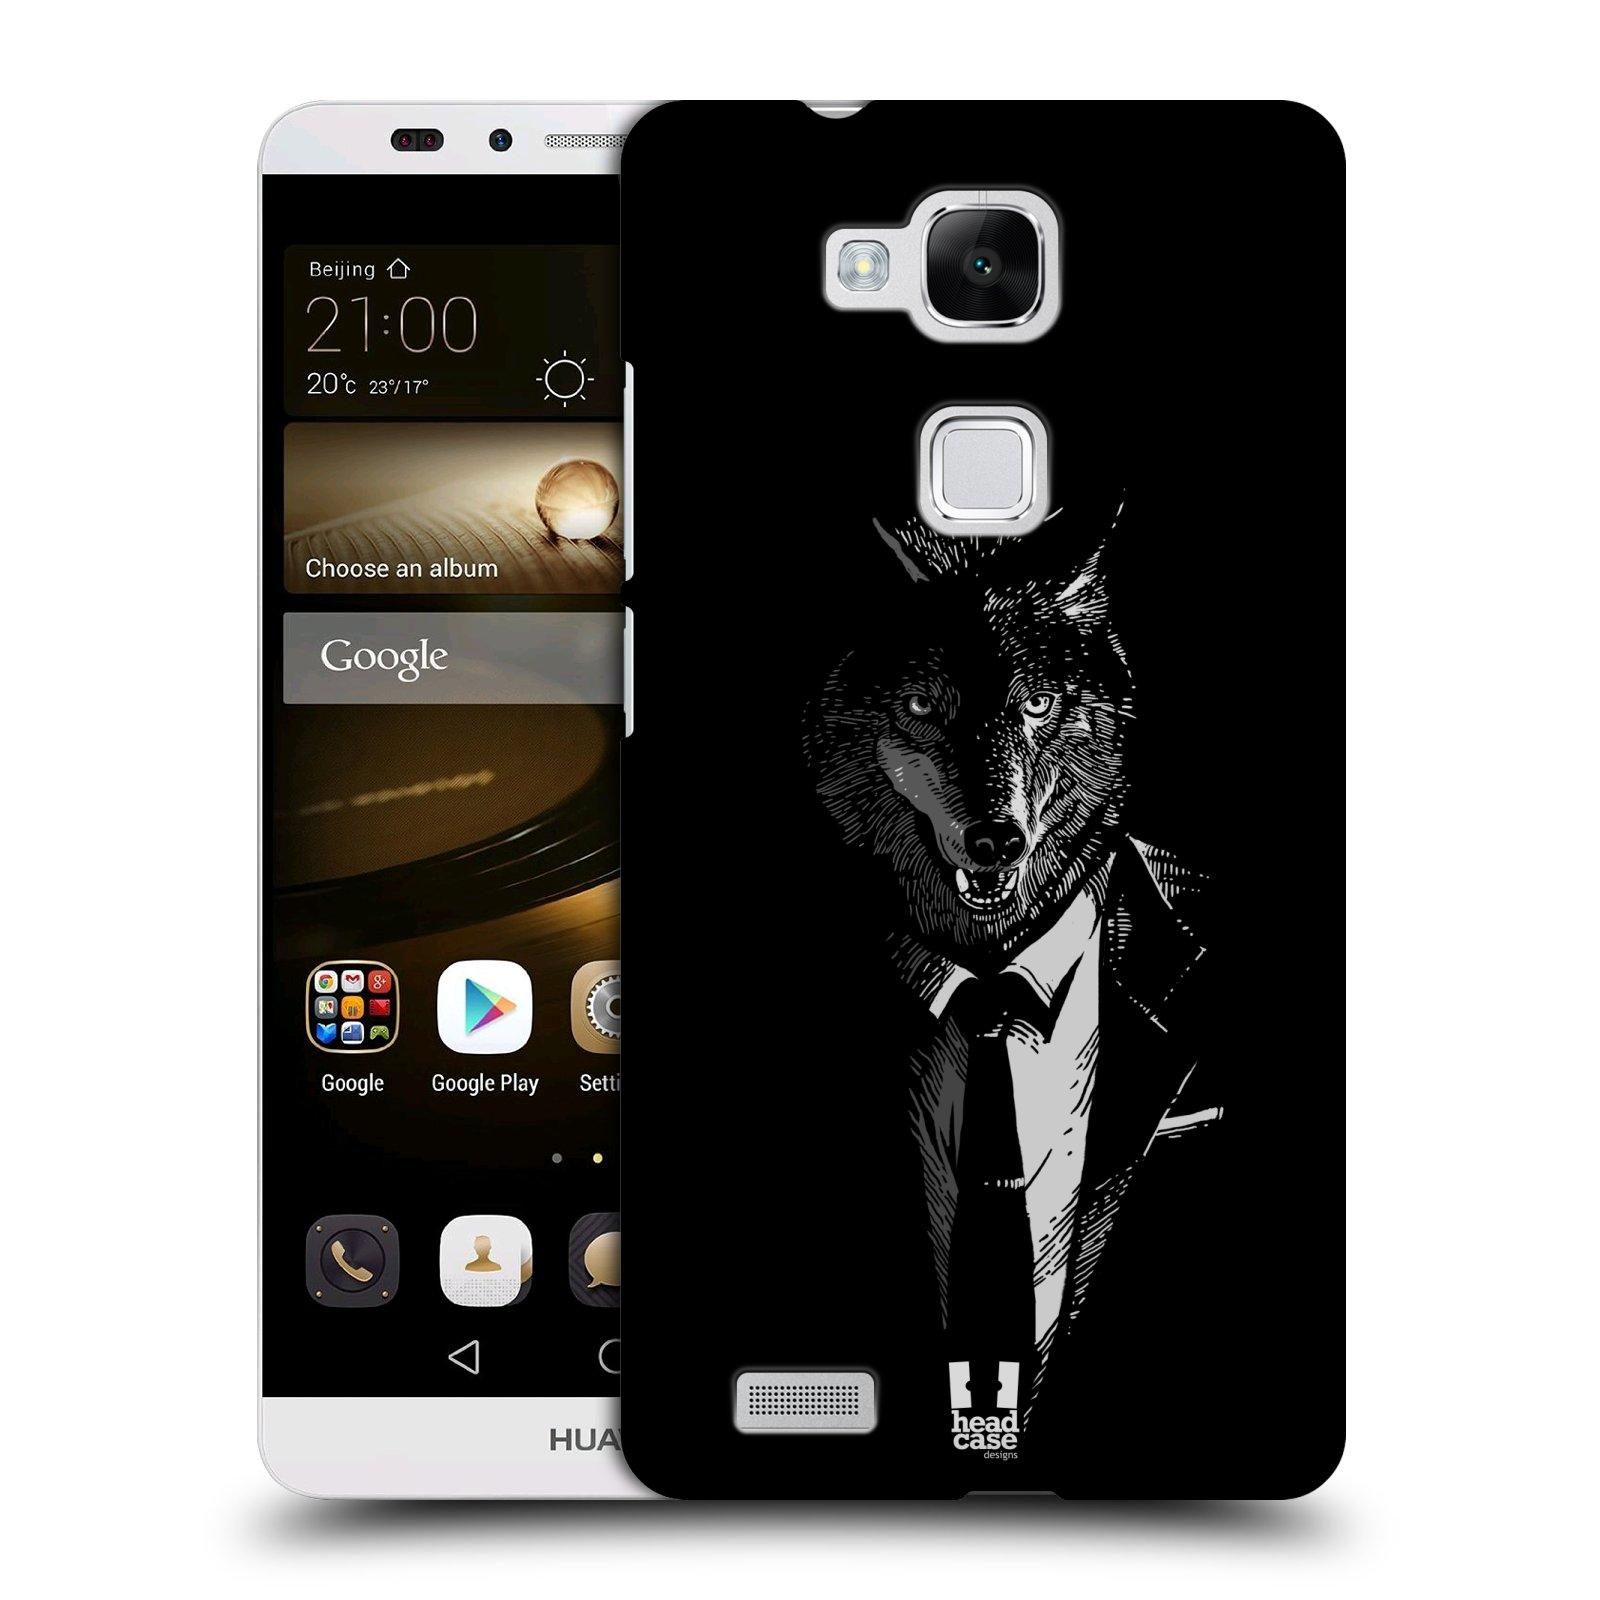 HEAD CASE plastový obal na mobil Huawei Mate 7 vzor Zvíře v obleku vlk